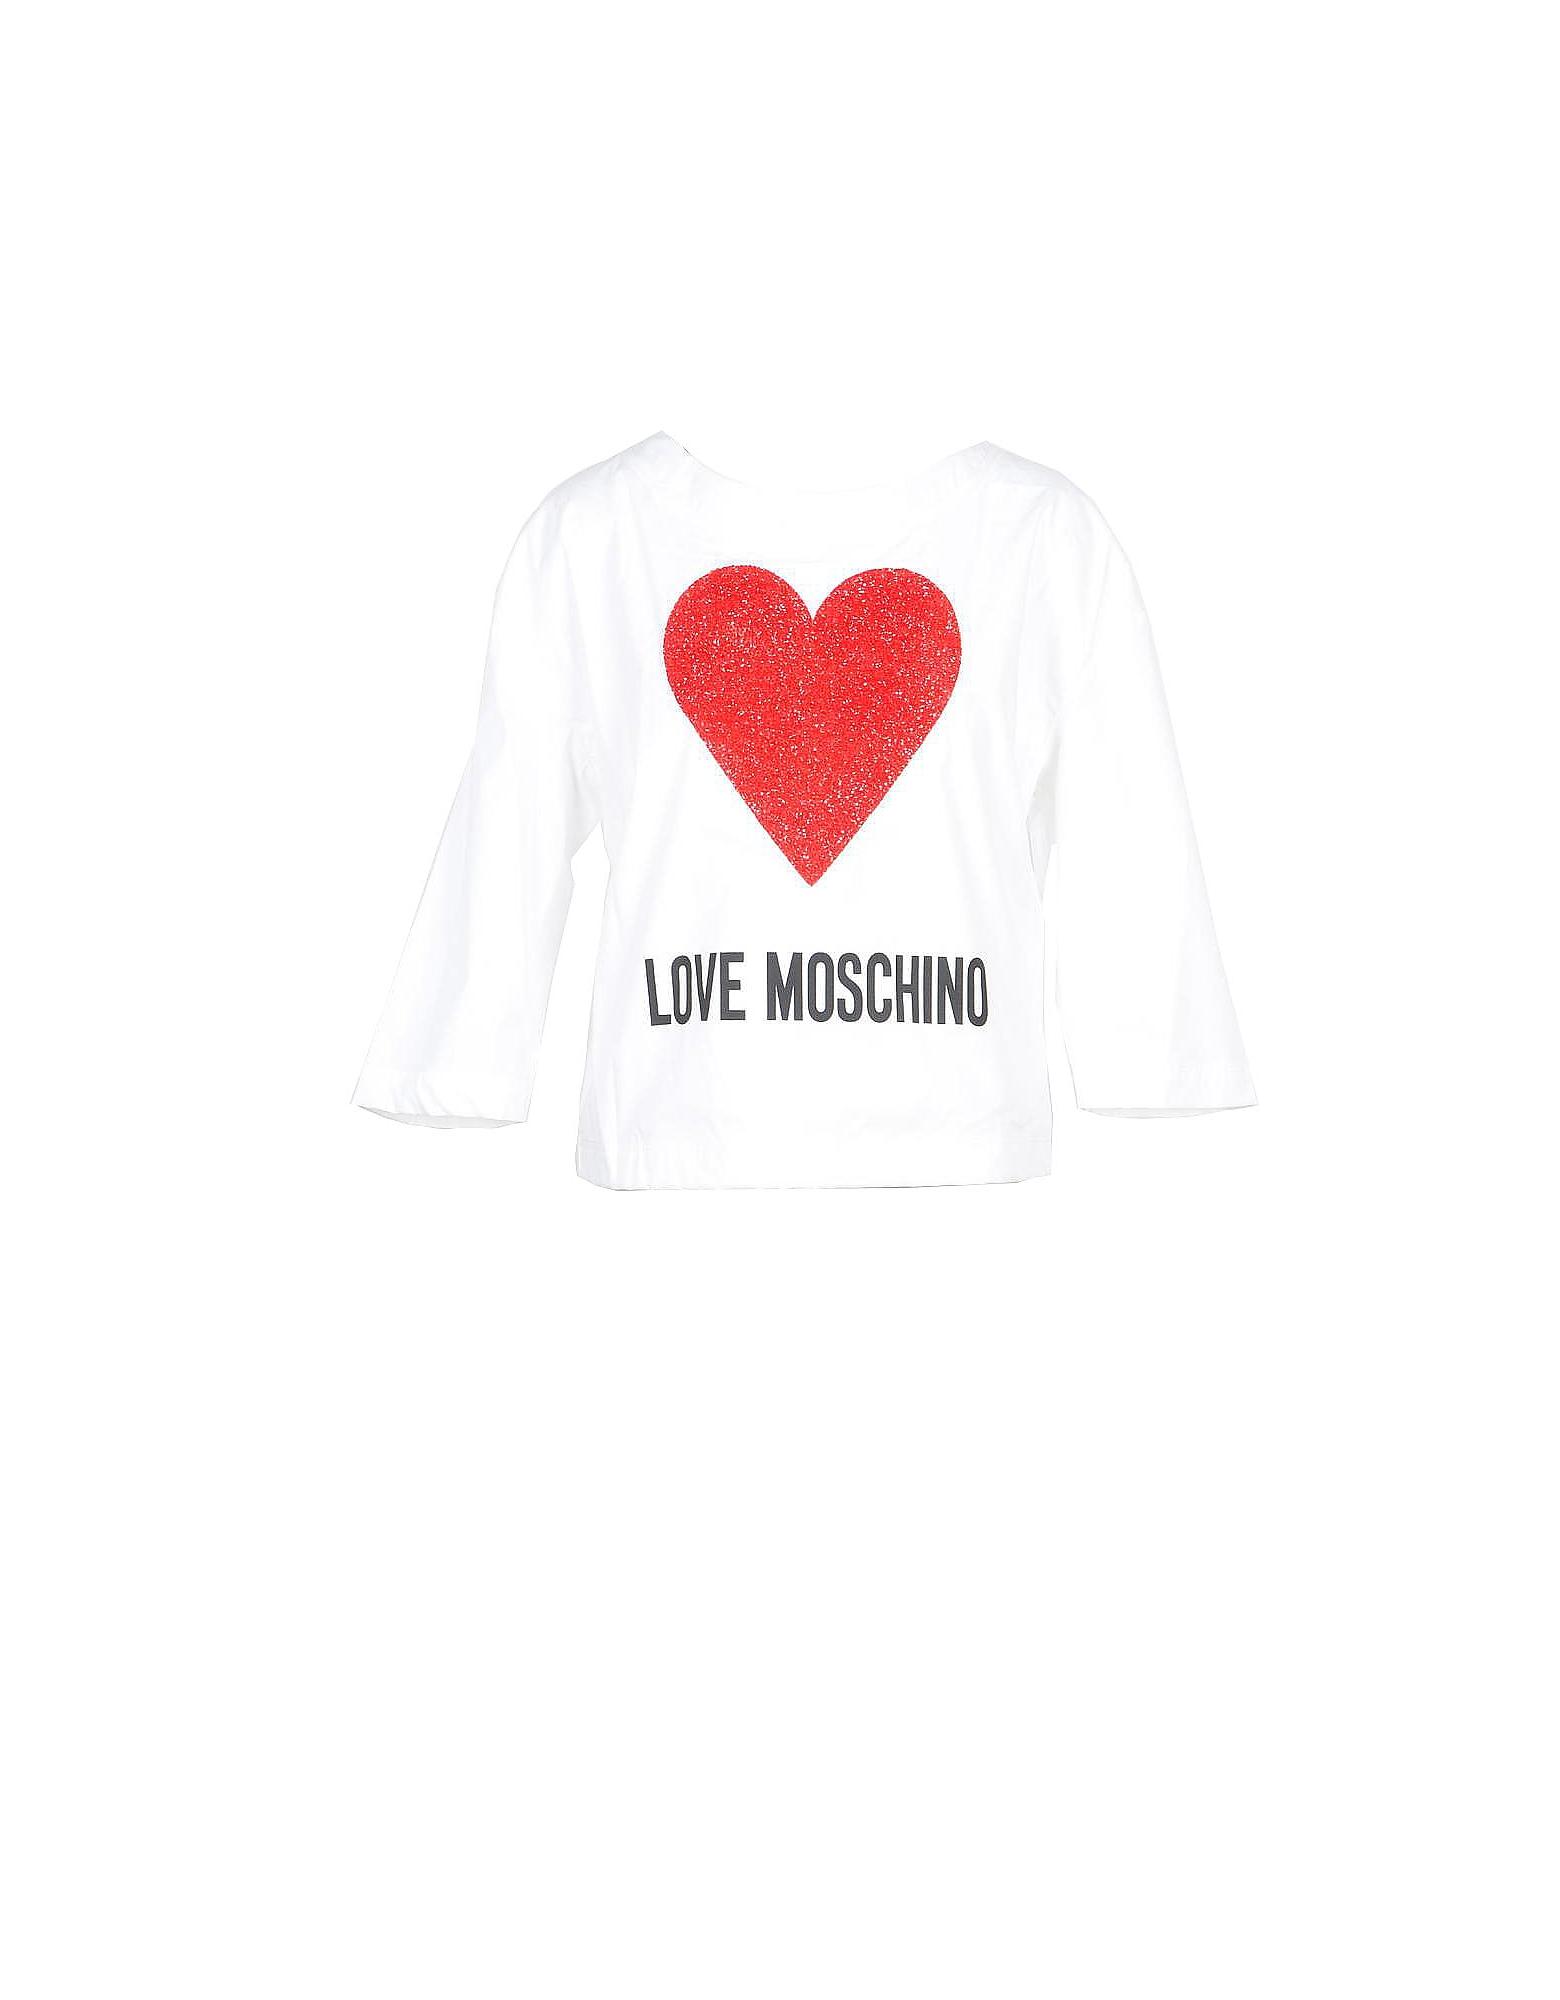 Love Moschino Designer T-Shirts & Tops, White Cotton Women's Long Sleeve T-Shirt w/Crystals Heart